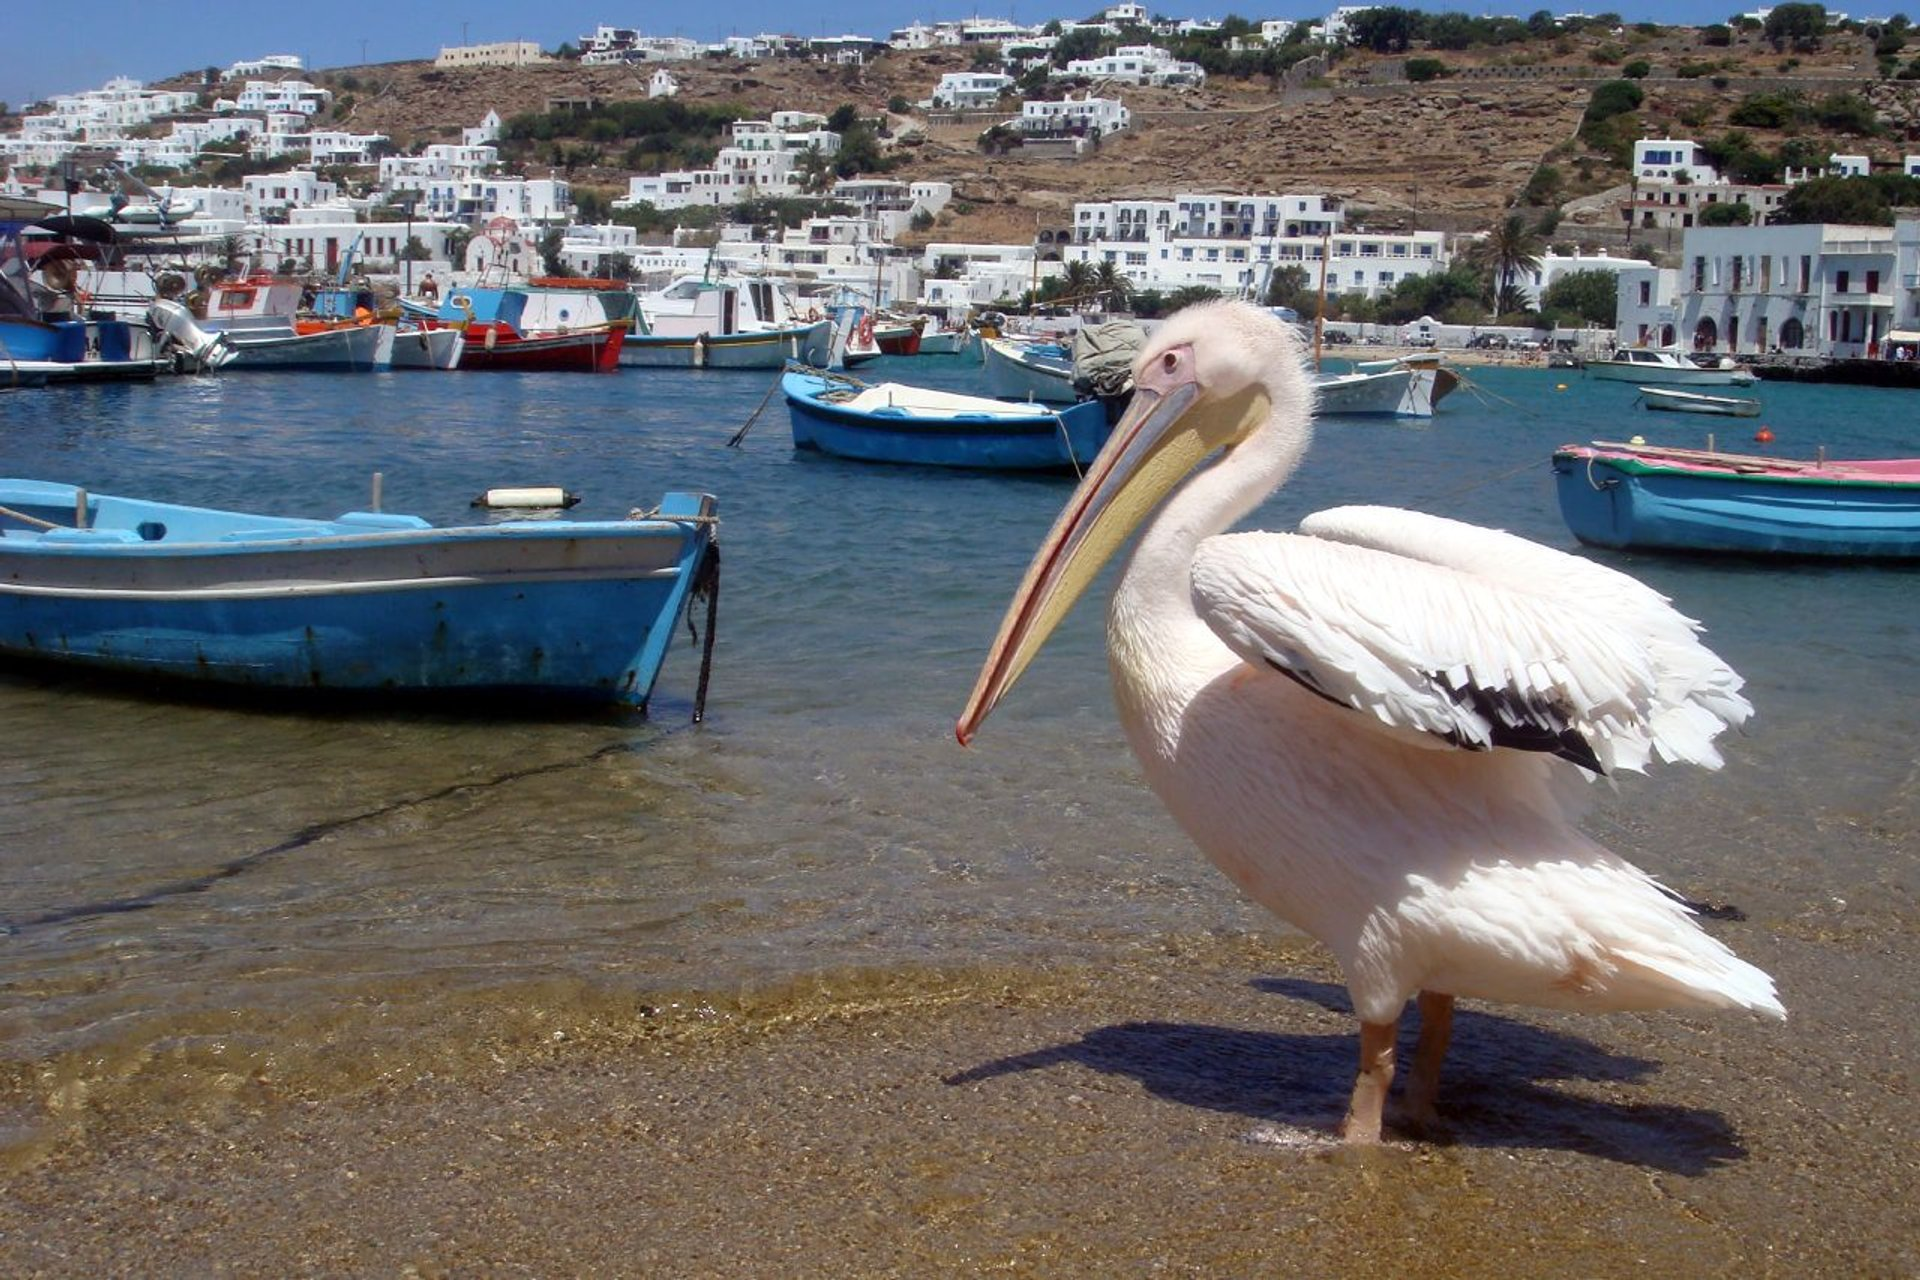 Birdwatching in Greece 2020 - Best Time